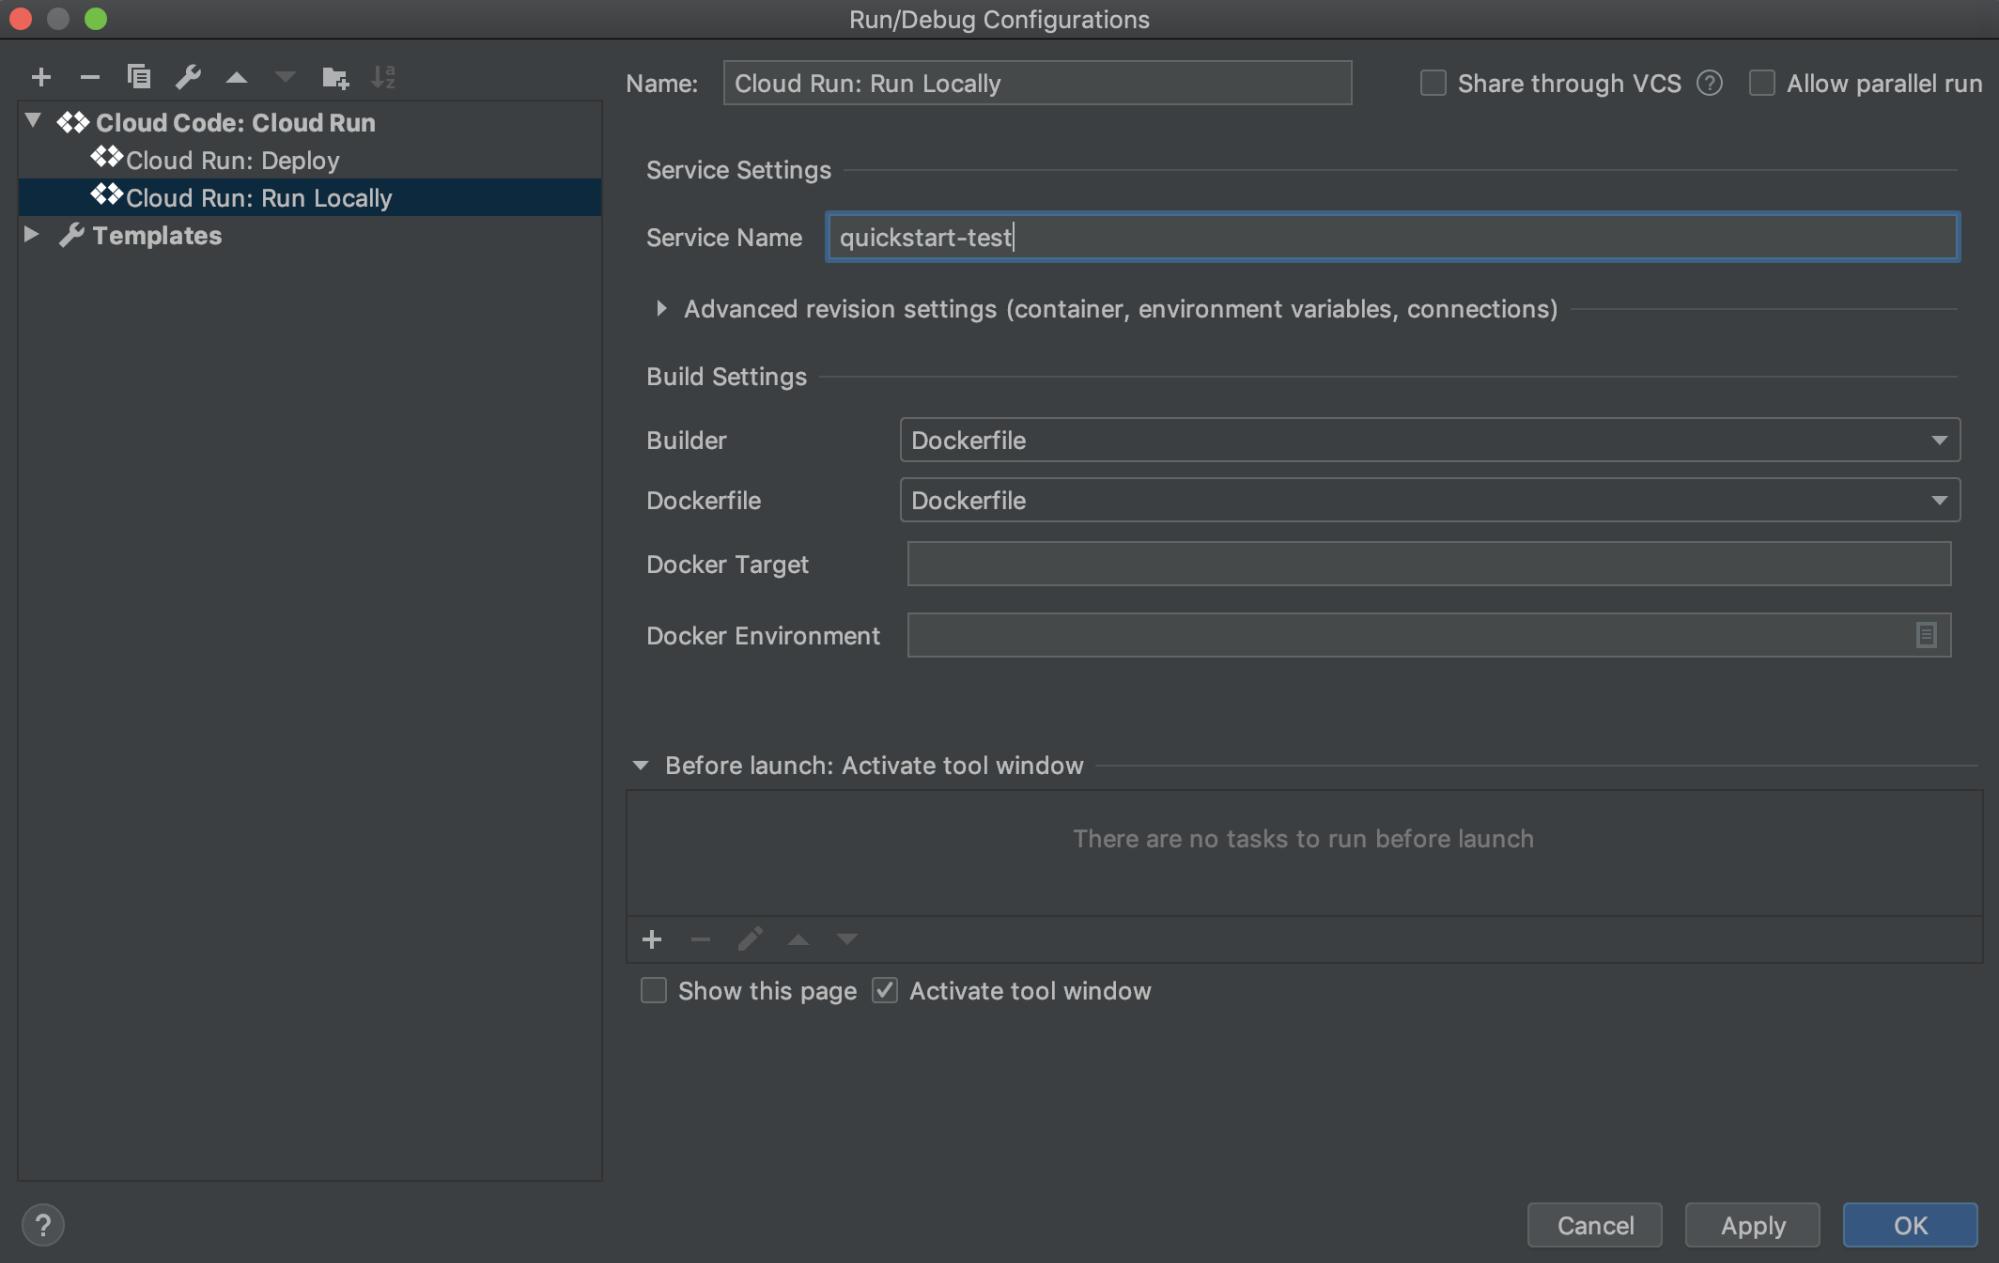 Cloud Run: Run locally configuration window